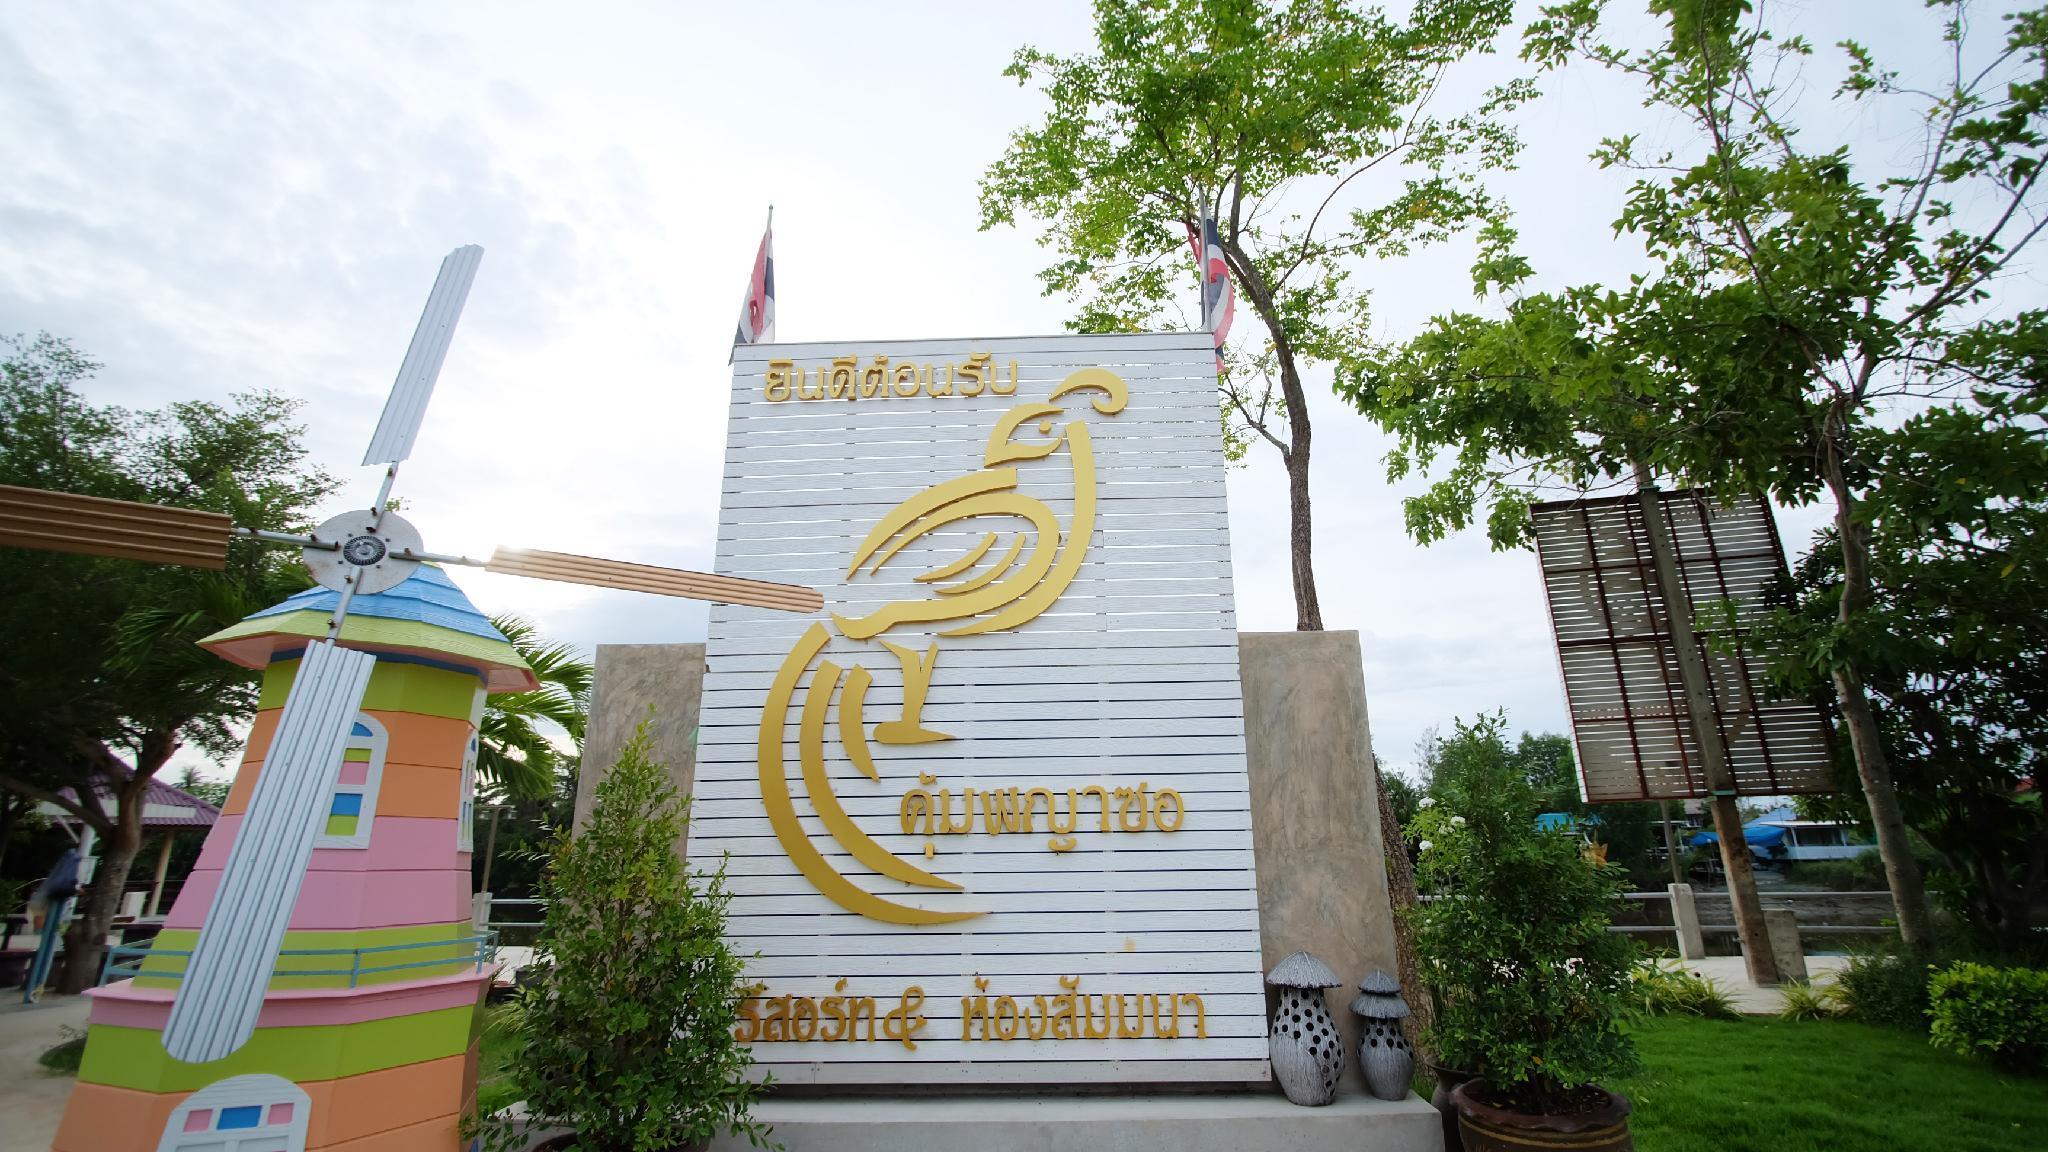 Khumphayasaw Resort